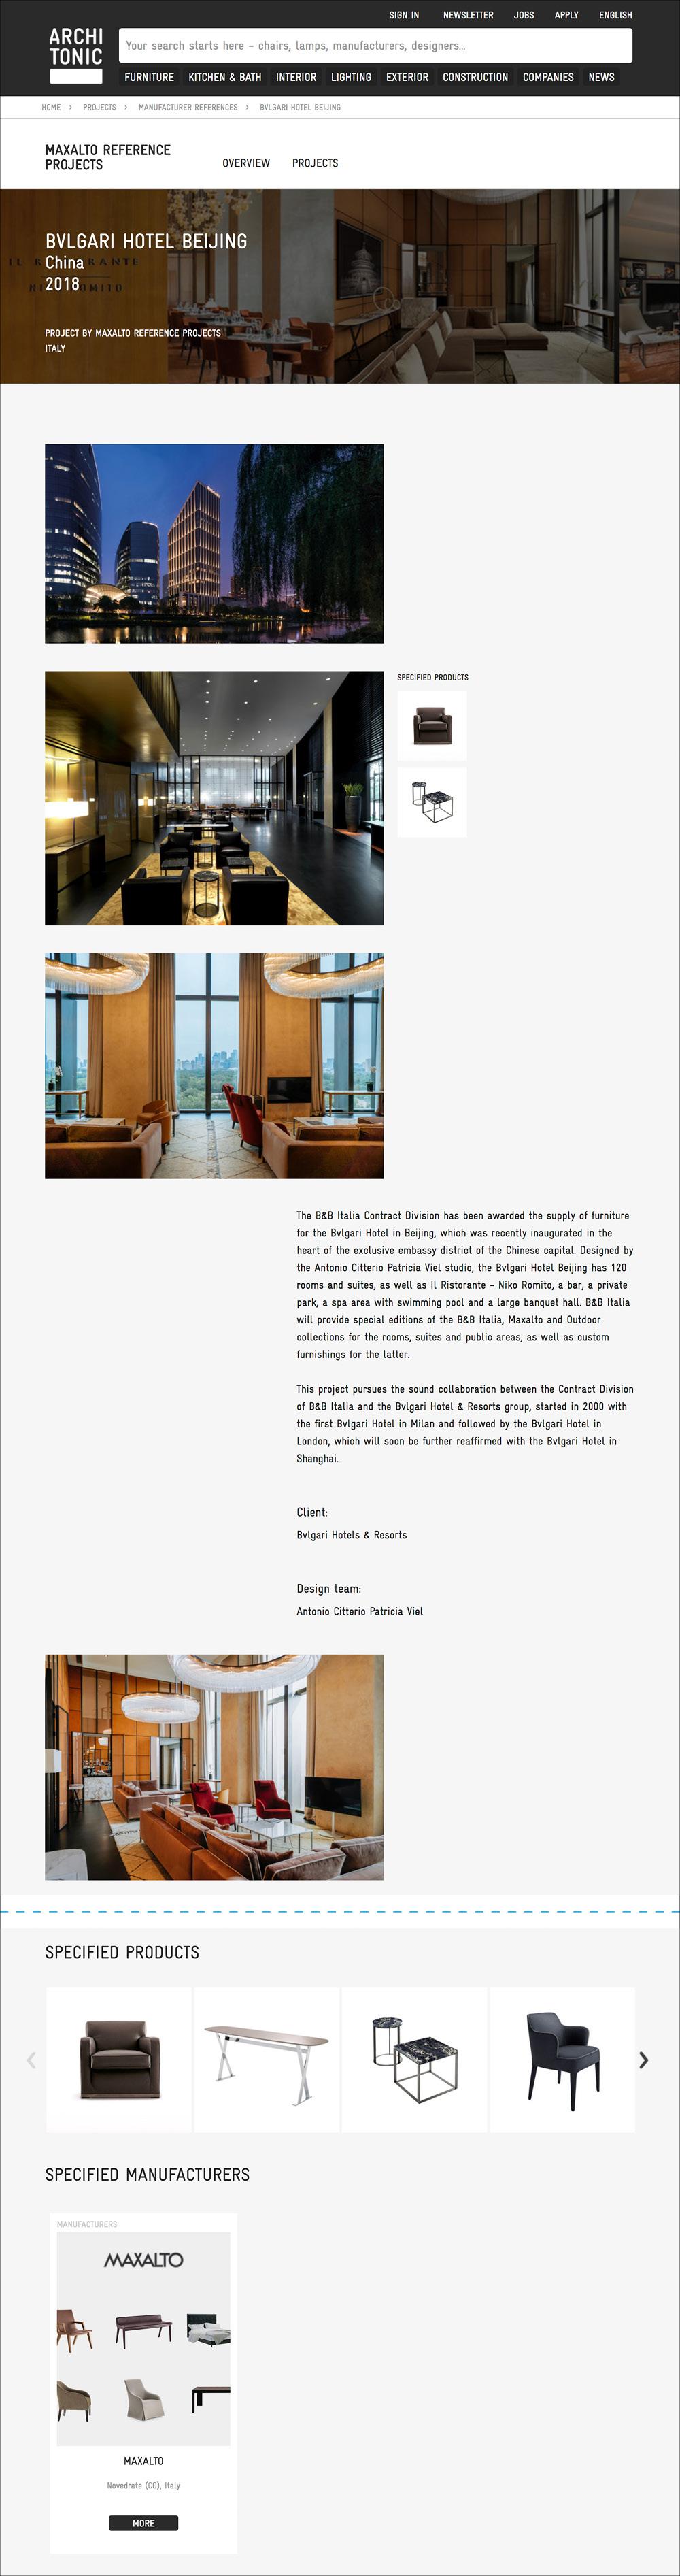 project-post_maxalto_bulgari-hotel-beijing.jpg